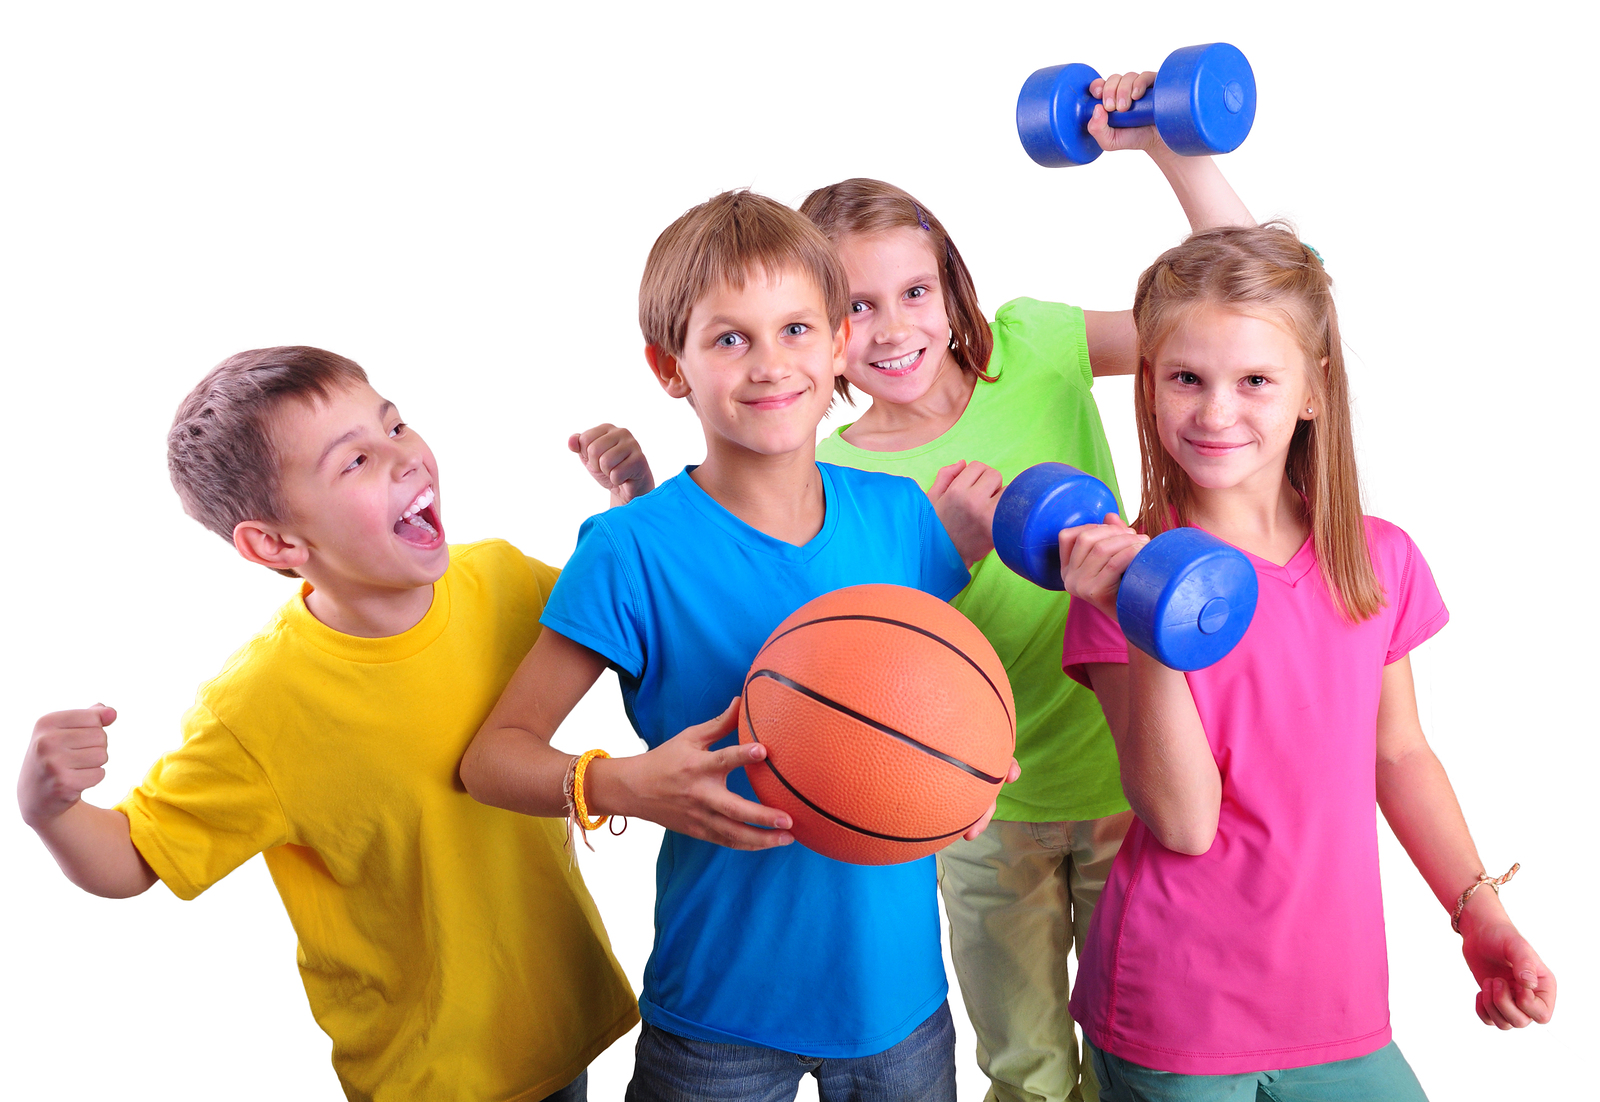 Gambar : Anak hobi berolahraga